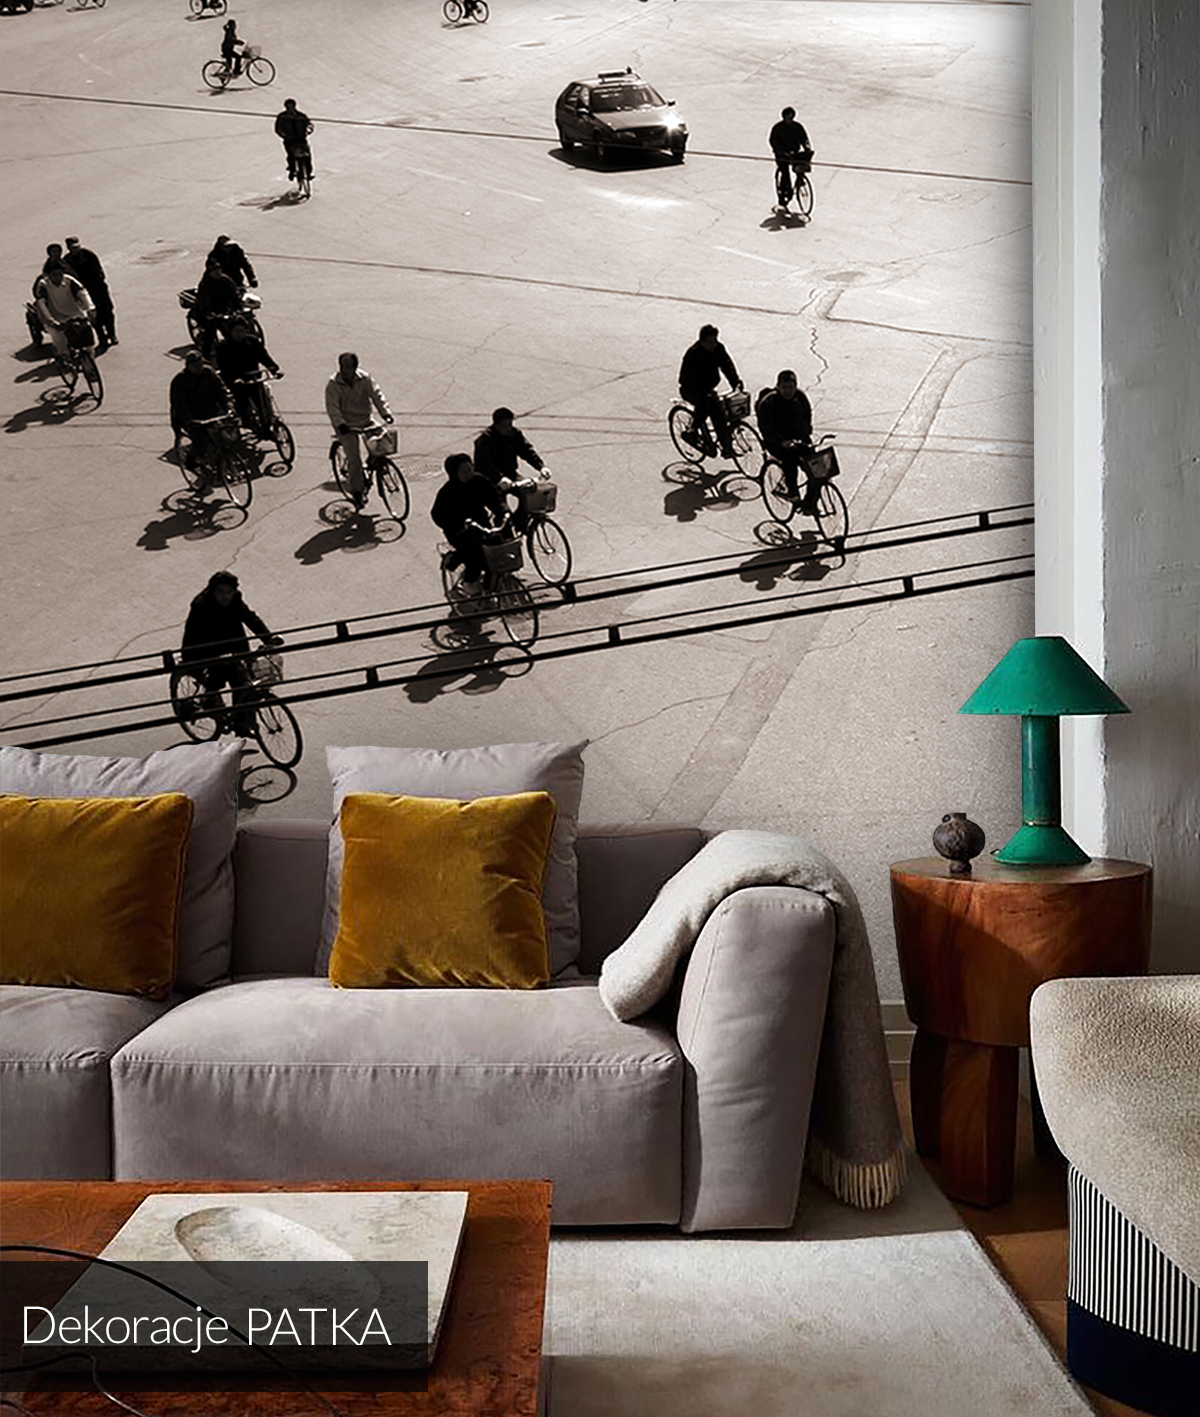 designerska-fototapeta-z-rowerami-na-ulicy-patrycja-kita-dekoracje-patka